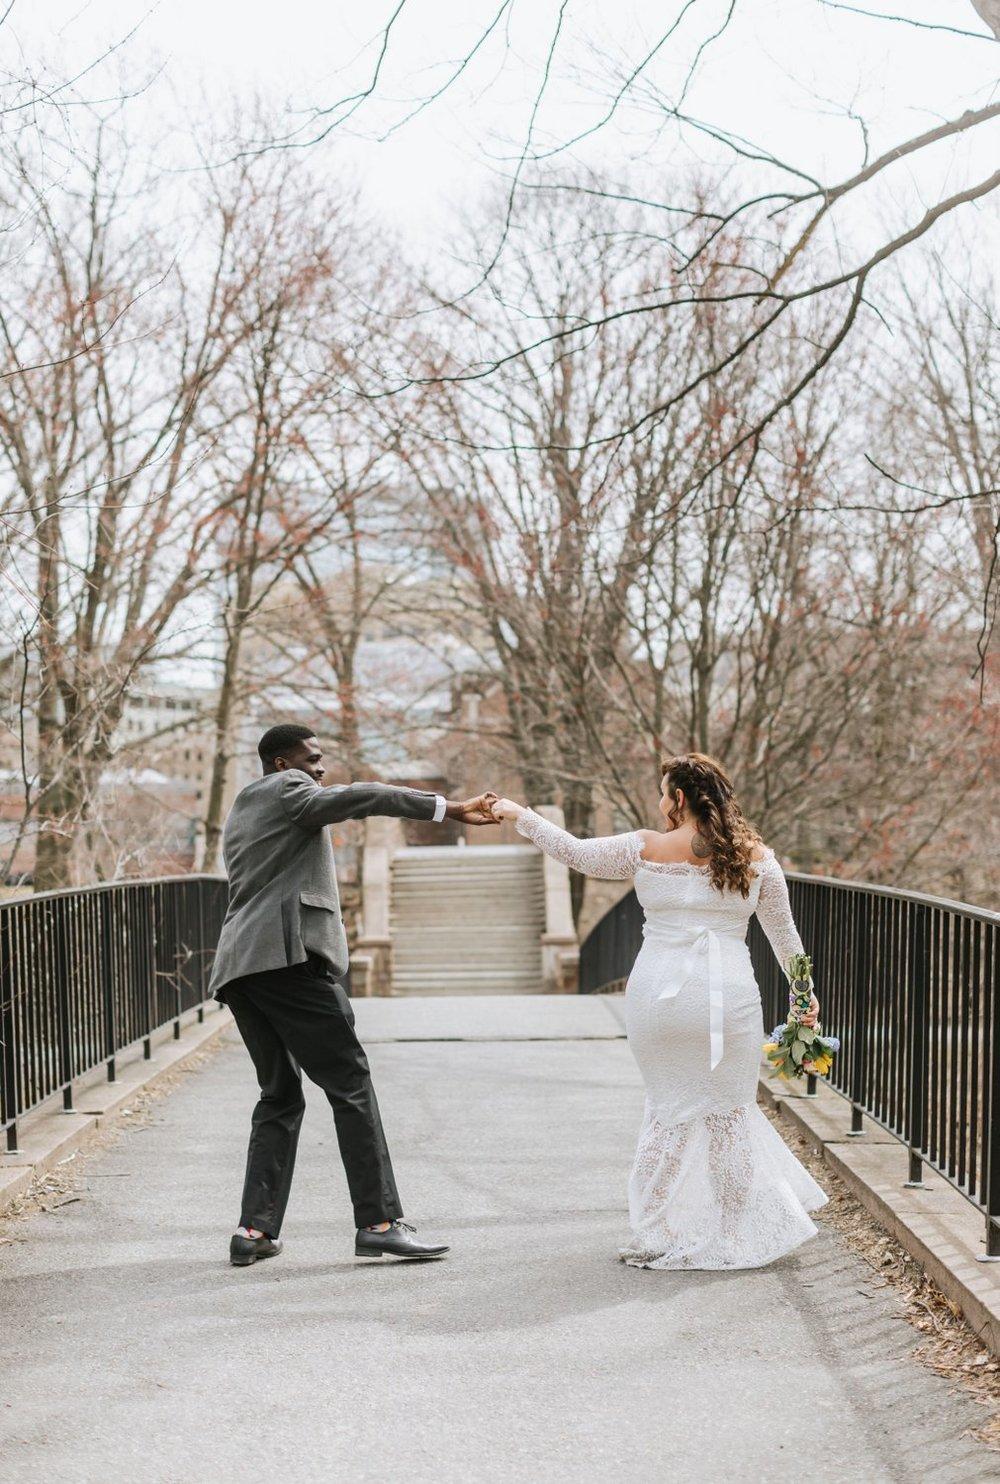 Zambian-African-Boston-Brookline-City-Hall-Wedding-15.jpg